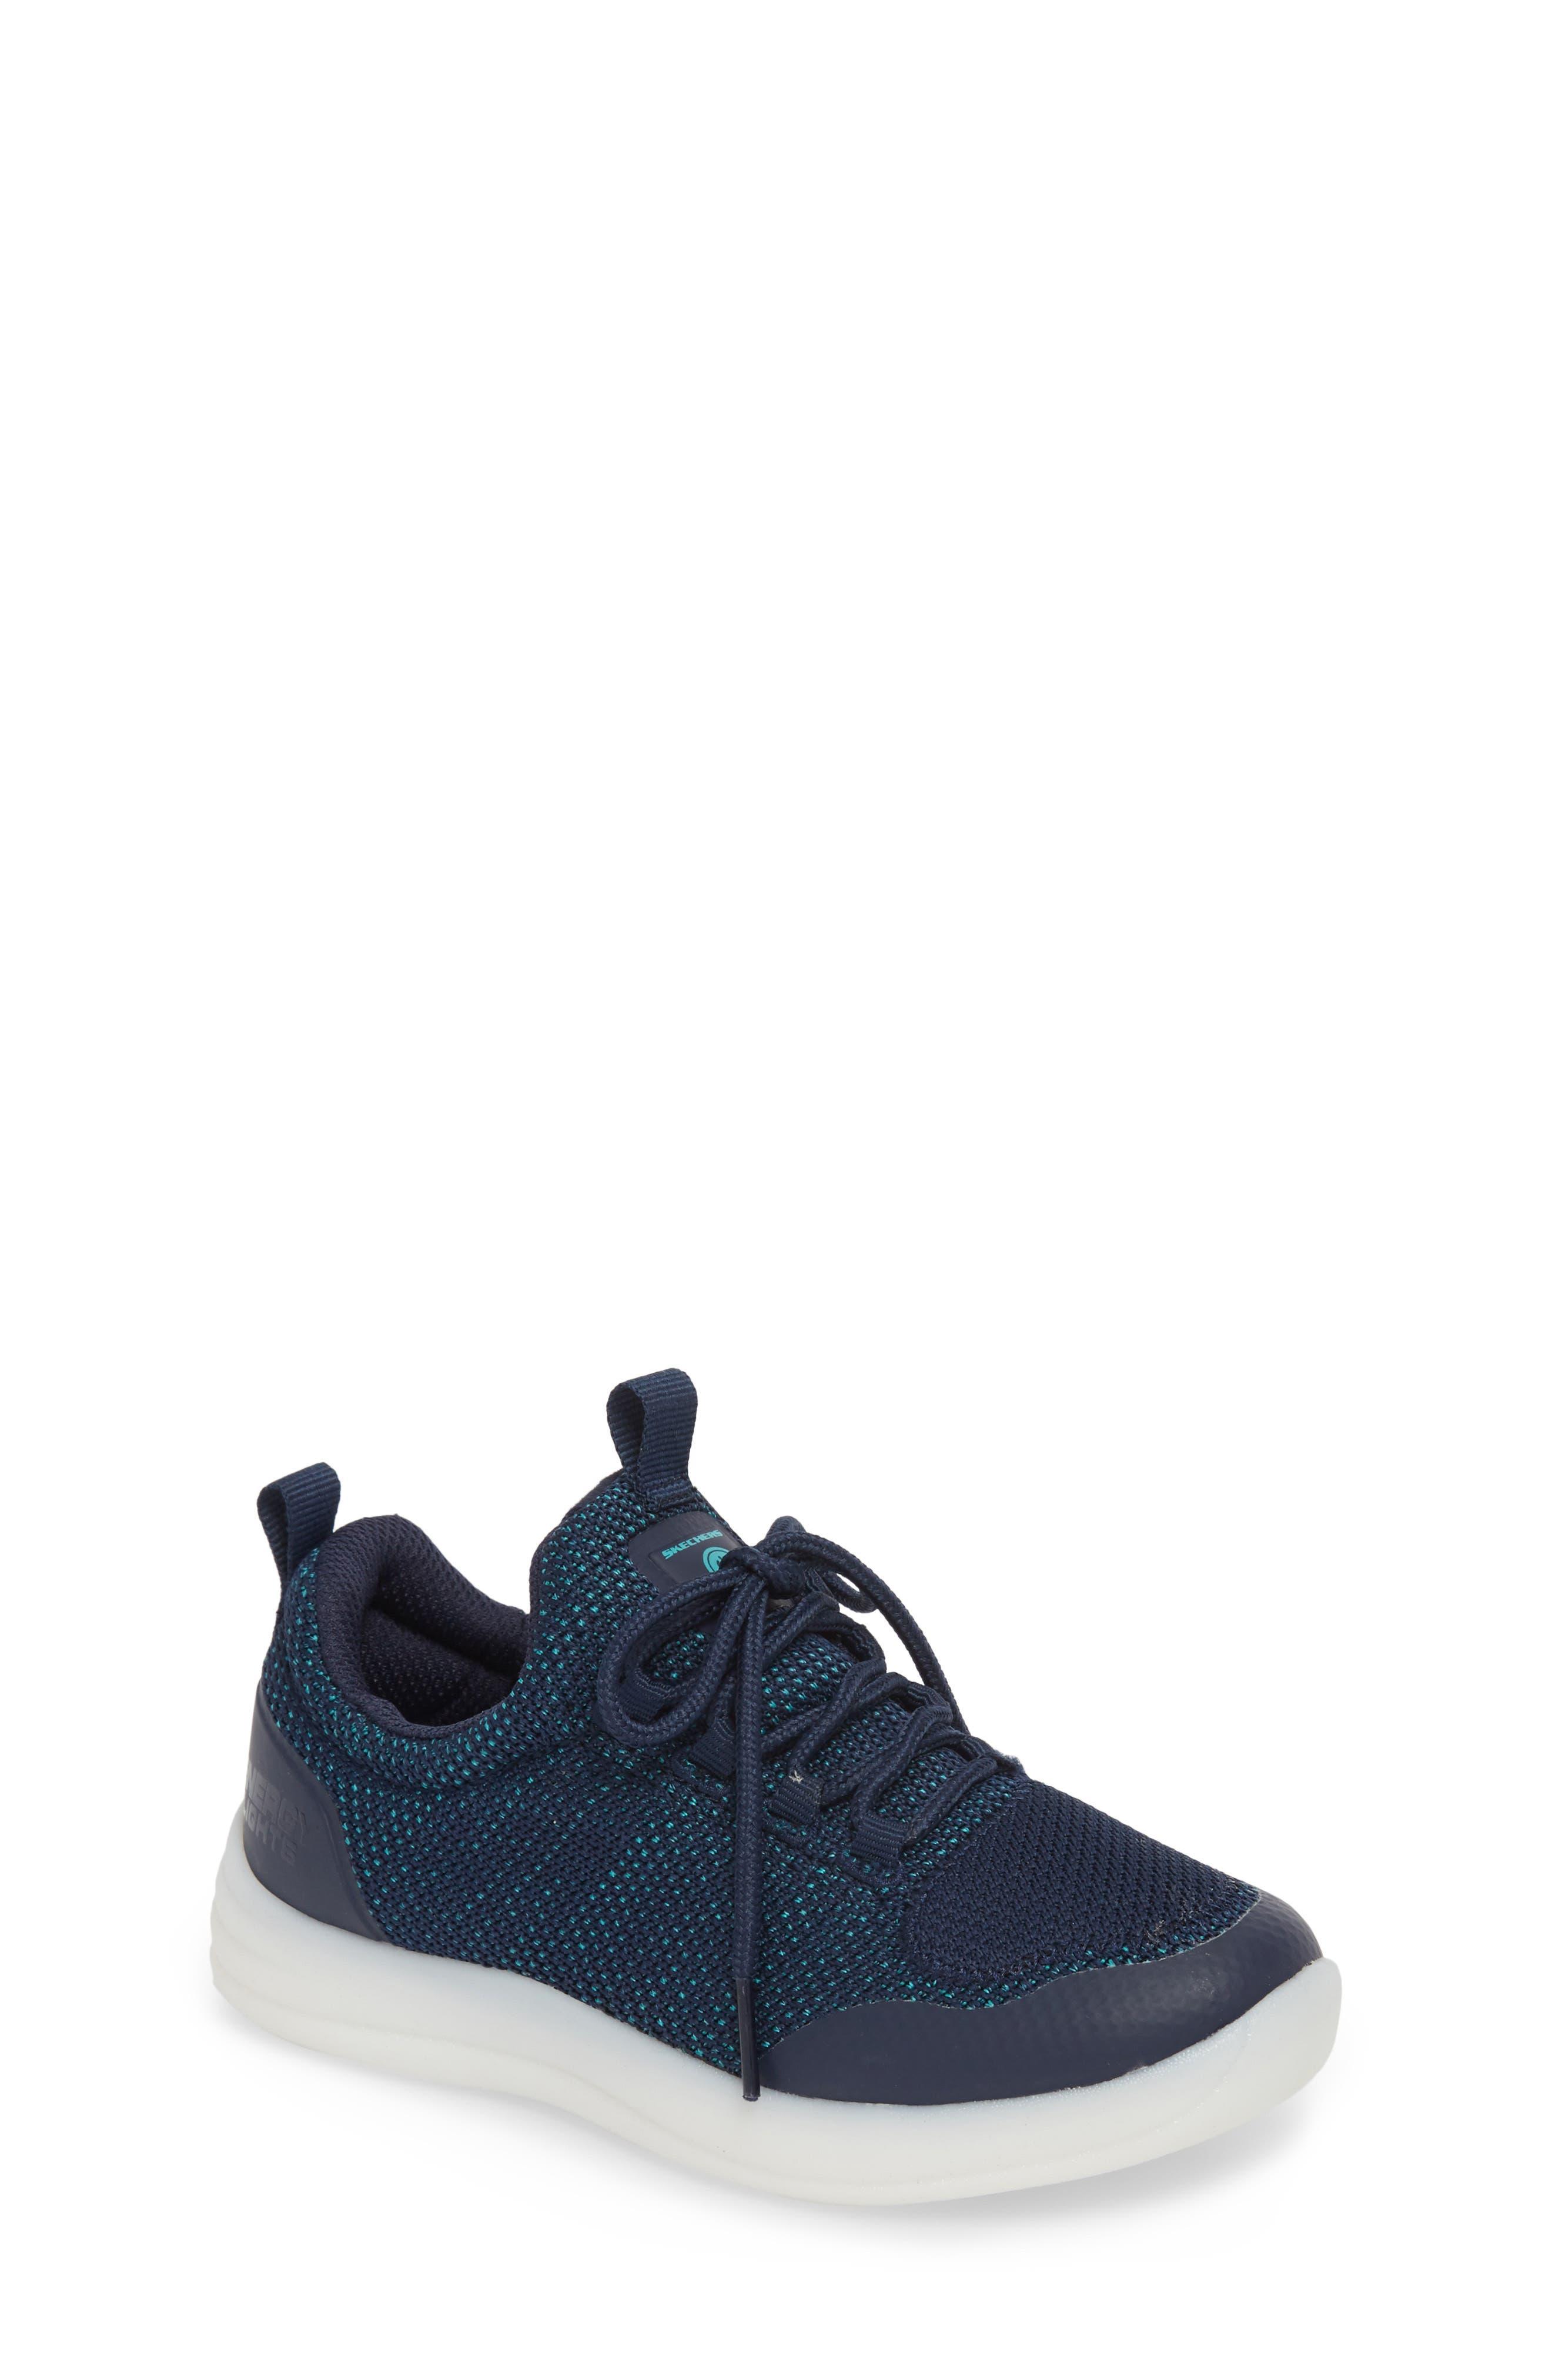 Energy Lights Street Sneaker,                             Main thumbnail 1, color,                             Navy